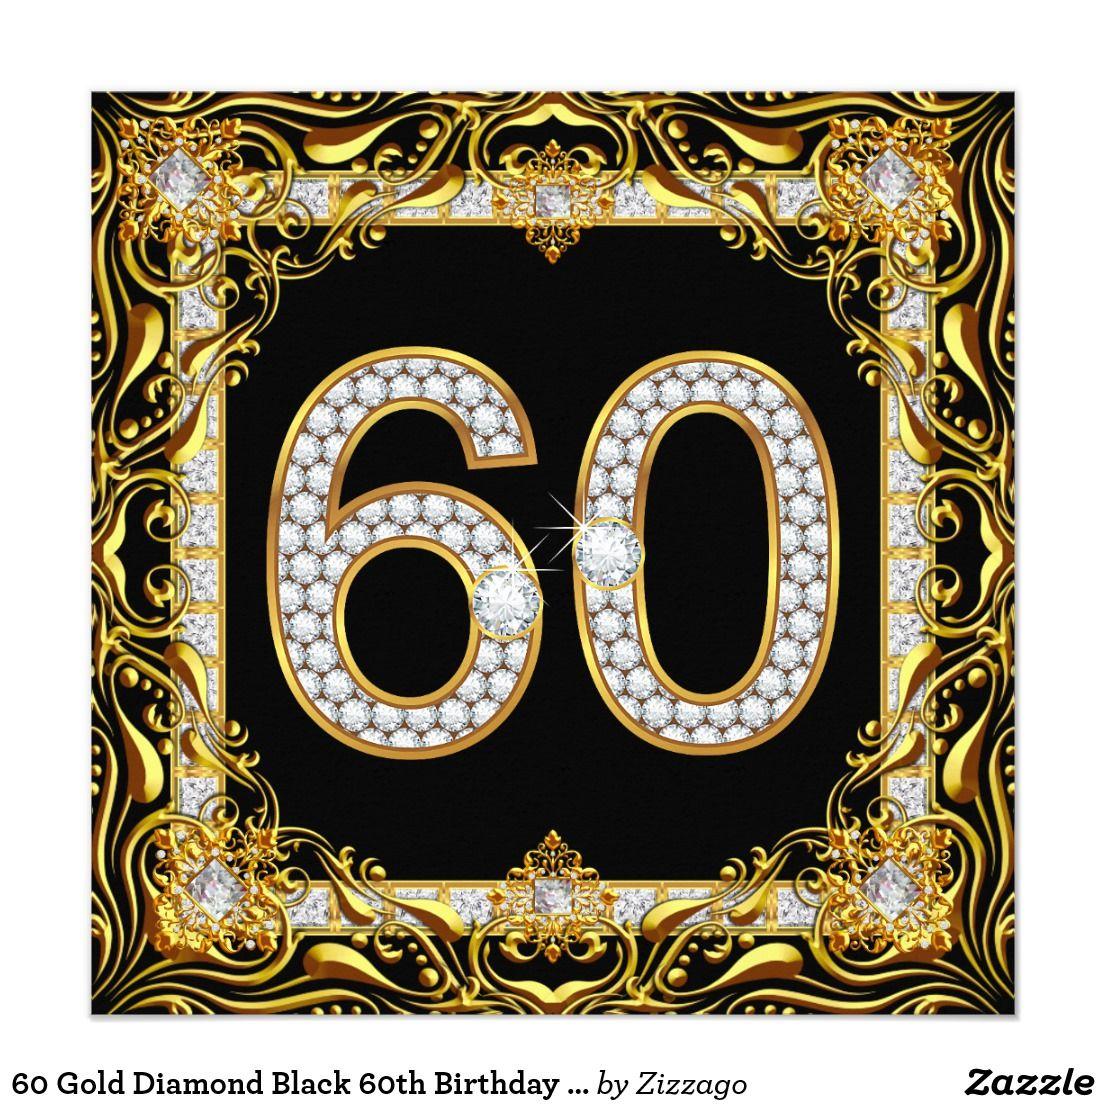 60 Gold Diamond Black 60th Birthday Party Invitation | Zazzle.com | 40th  birthday party invites, 60th birthday party invitations, Black gold party